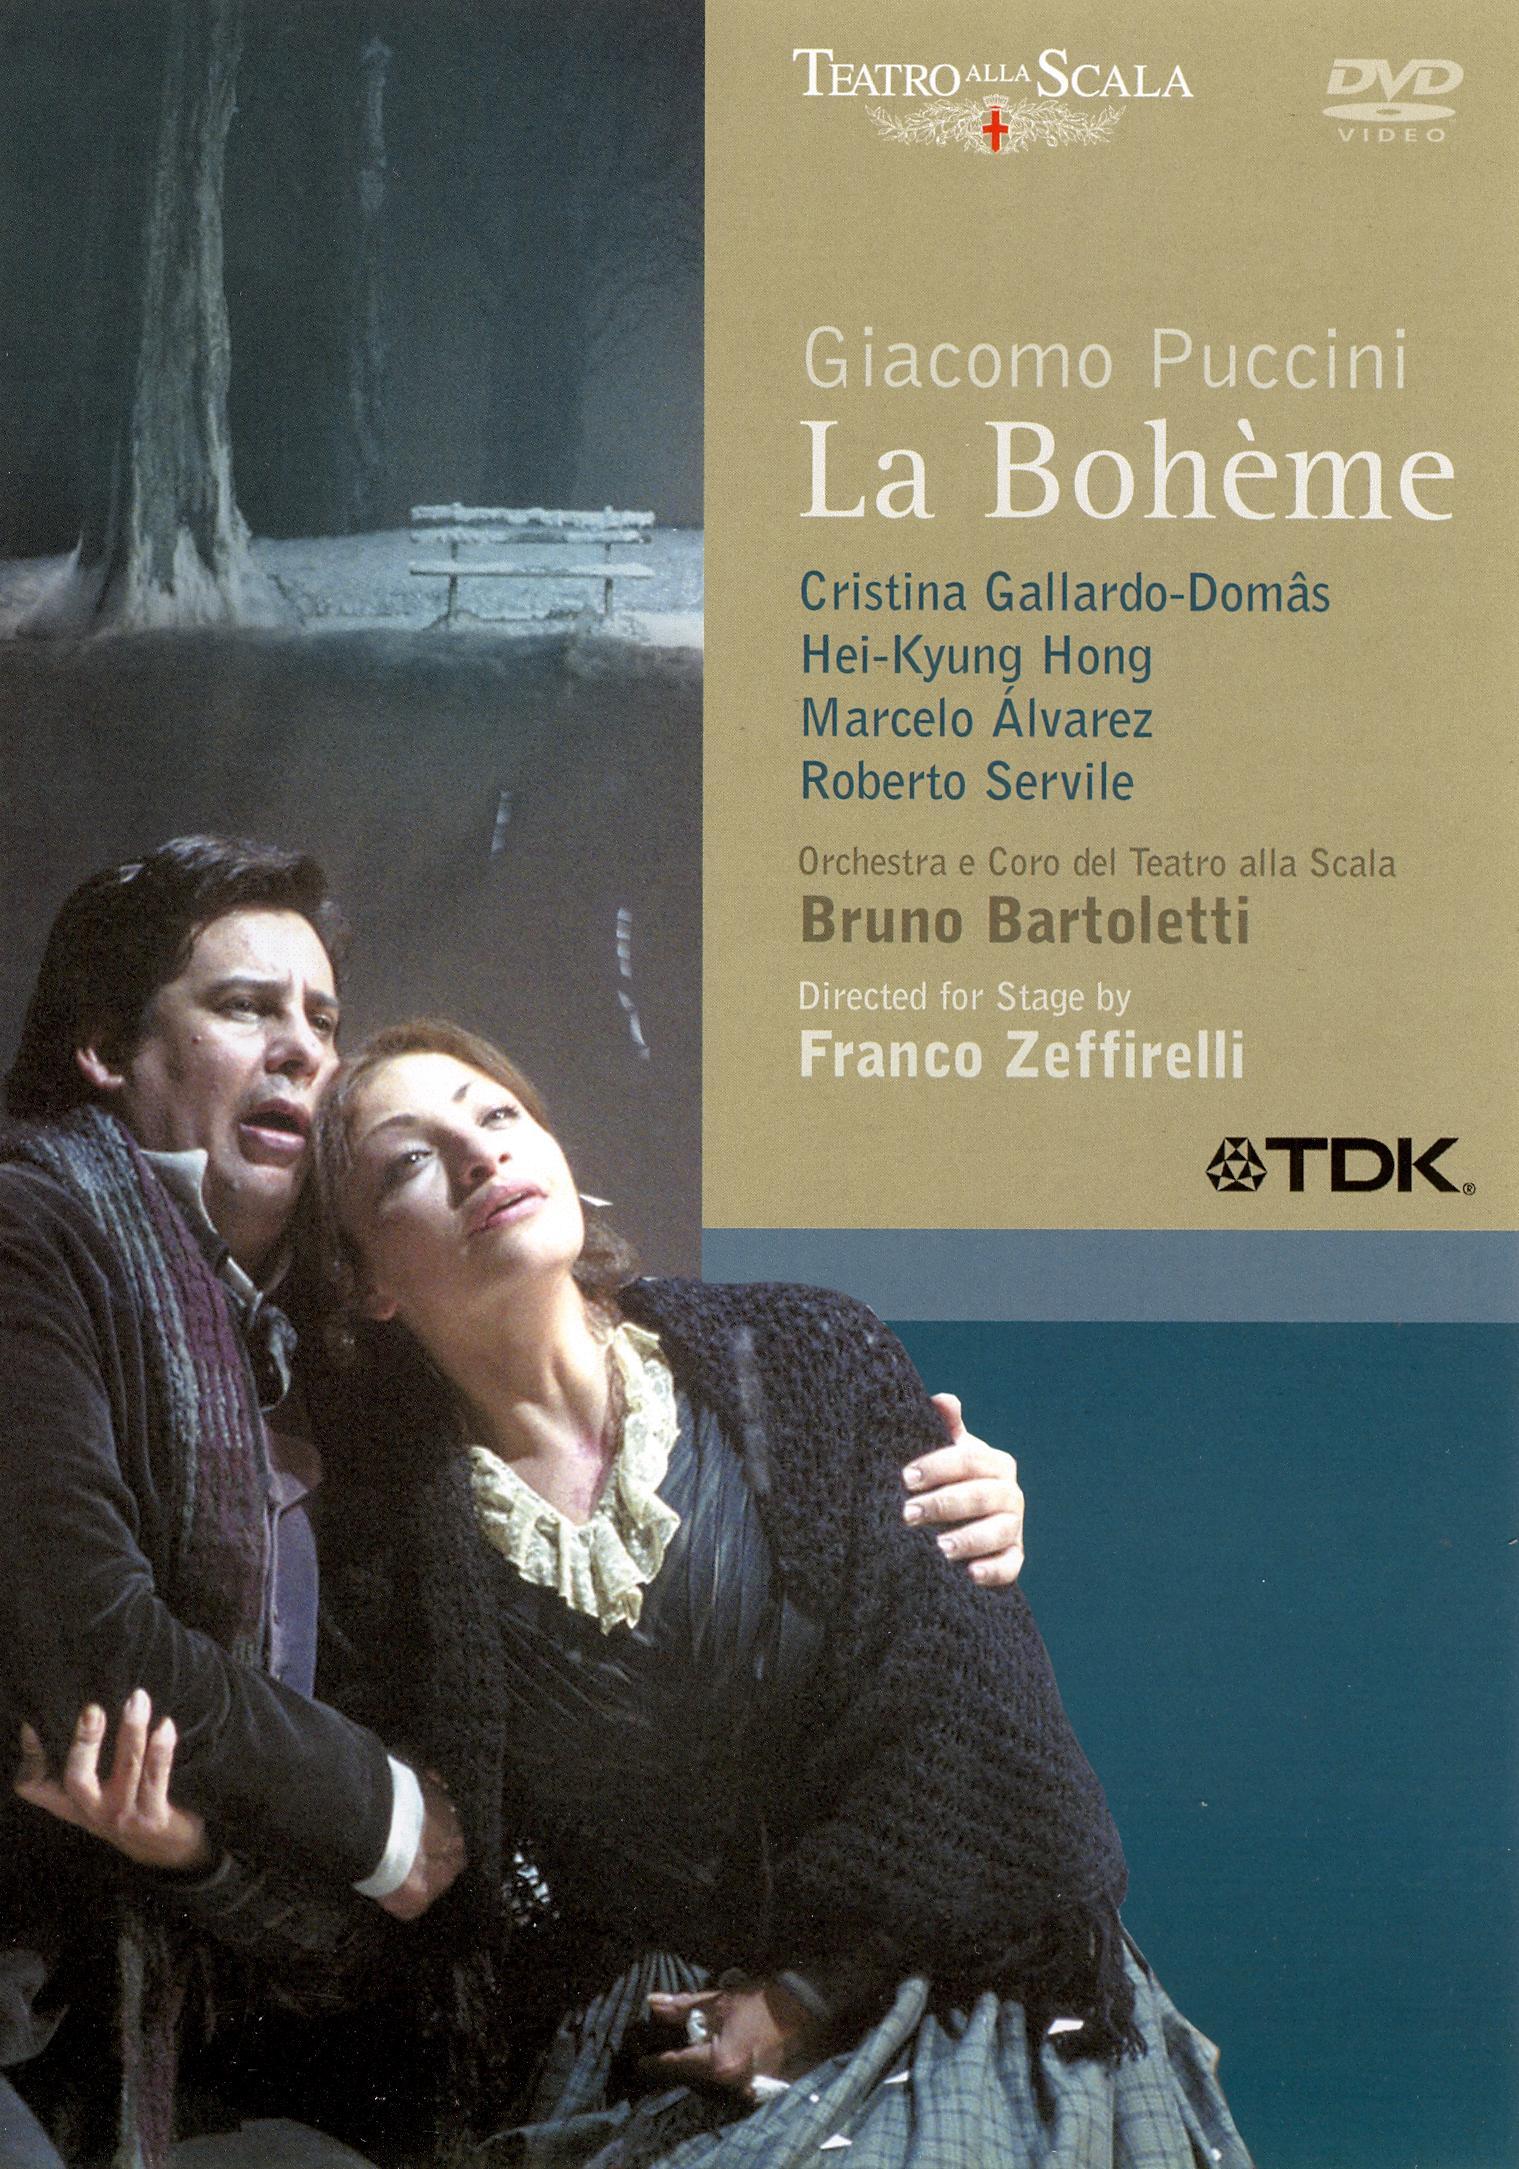 La Bohème (Teatro alla Scala)